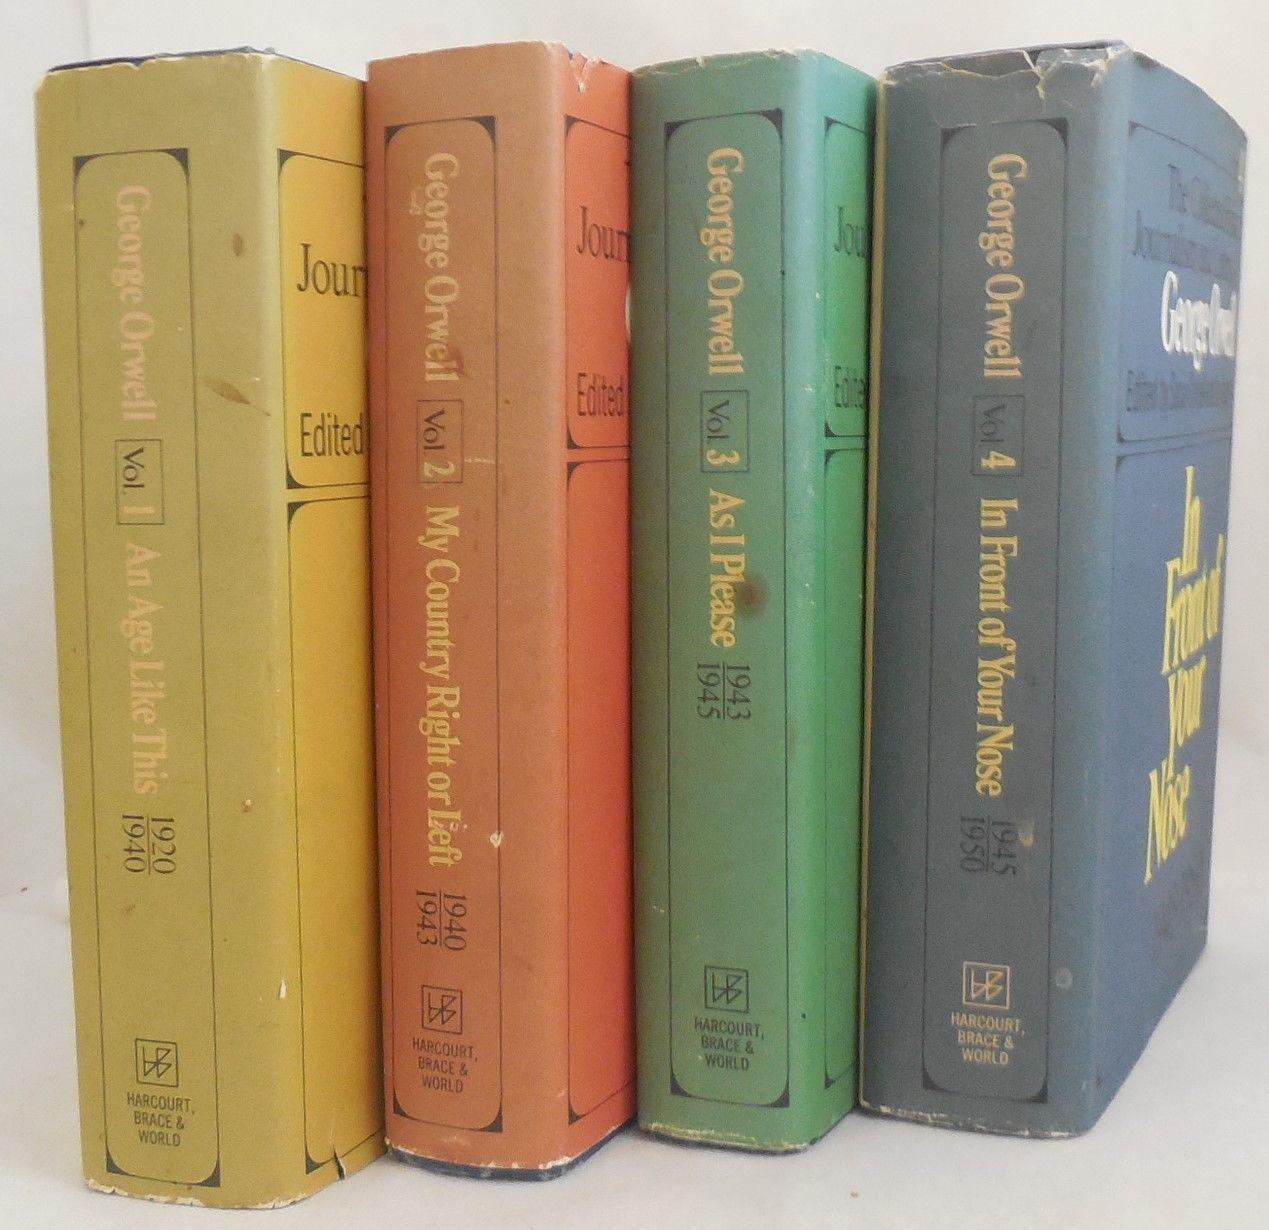 019 Essay Example Orwell Essays  57 31080 Singular Themes Epub George Pdf DownloadFull